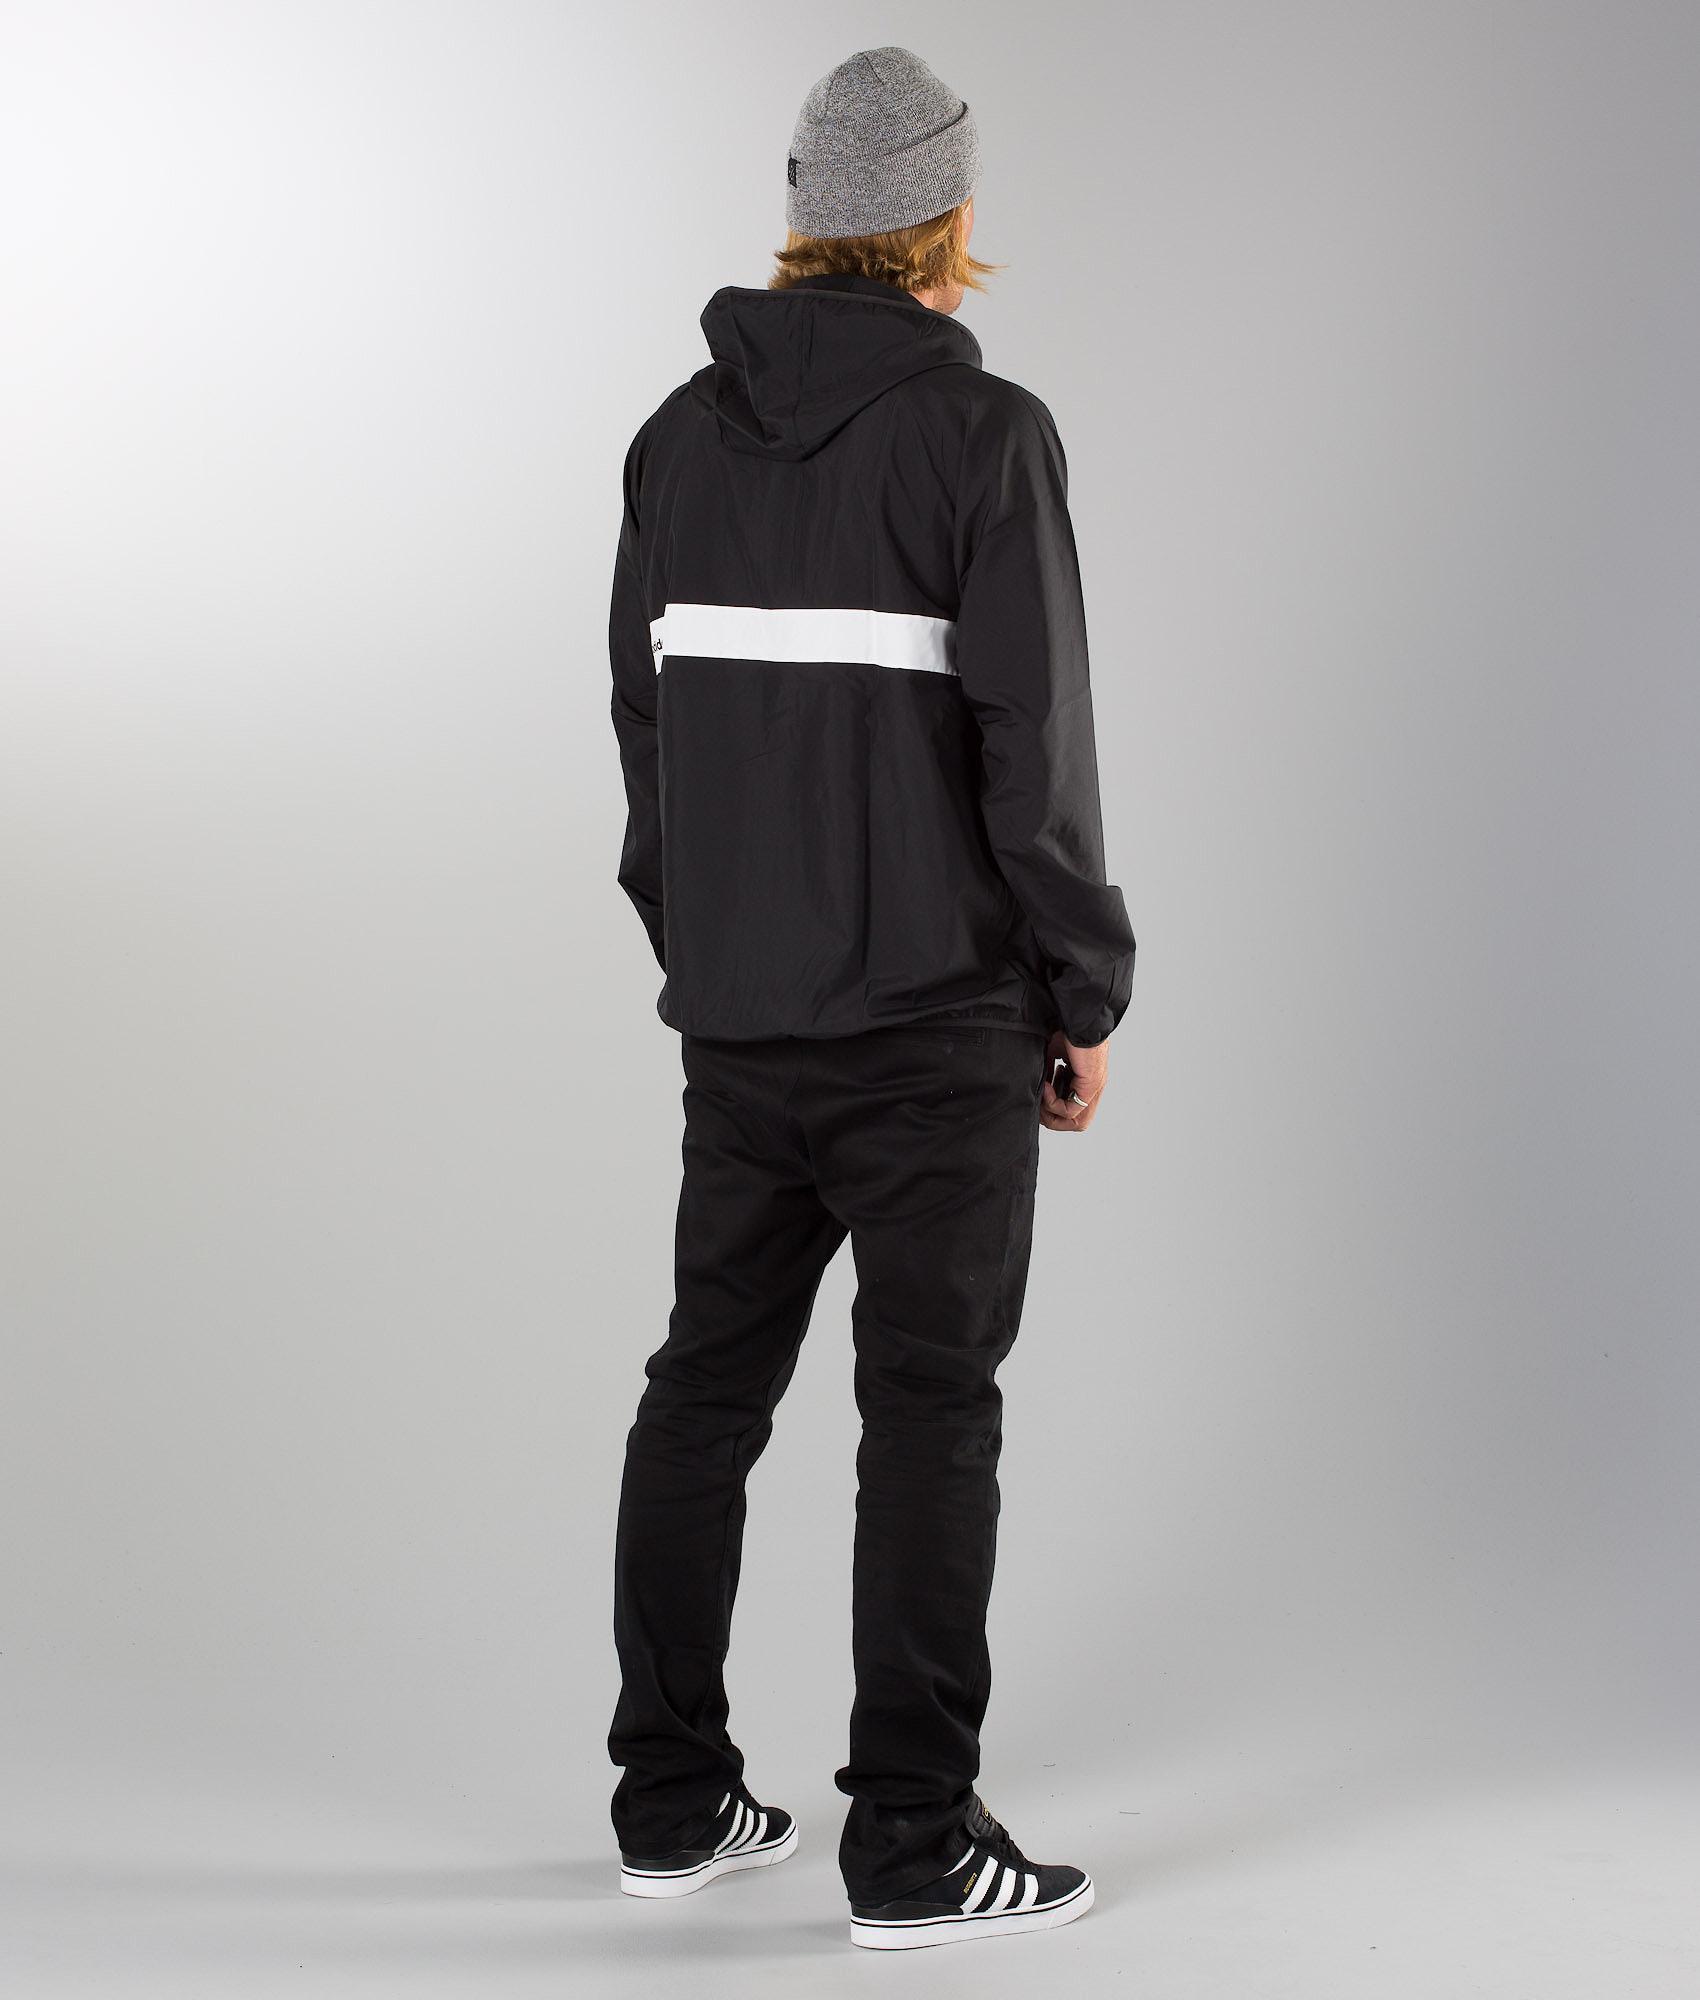 e5b78518 Adidas Skateboarding Blackbird Wind Jacket Black/White - Ridestore.com